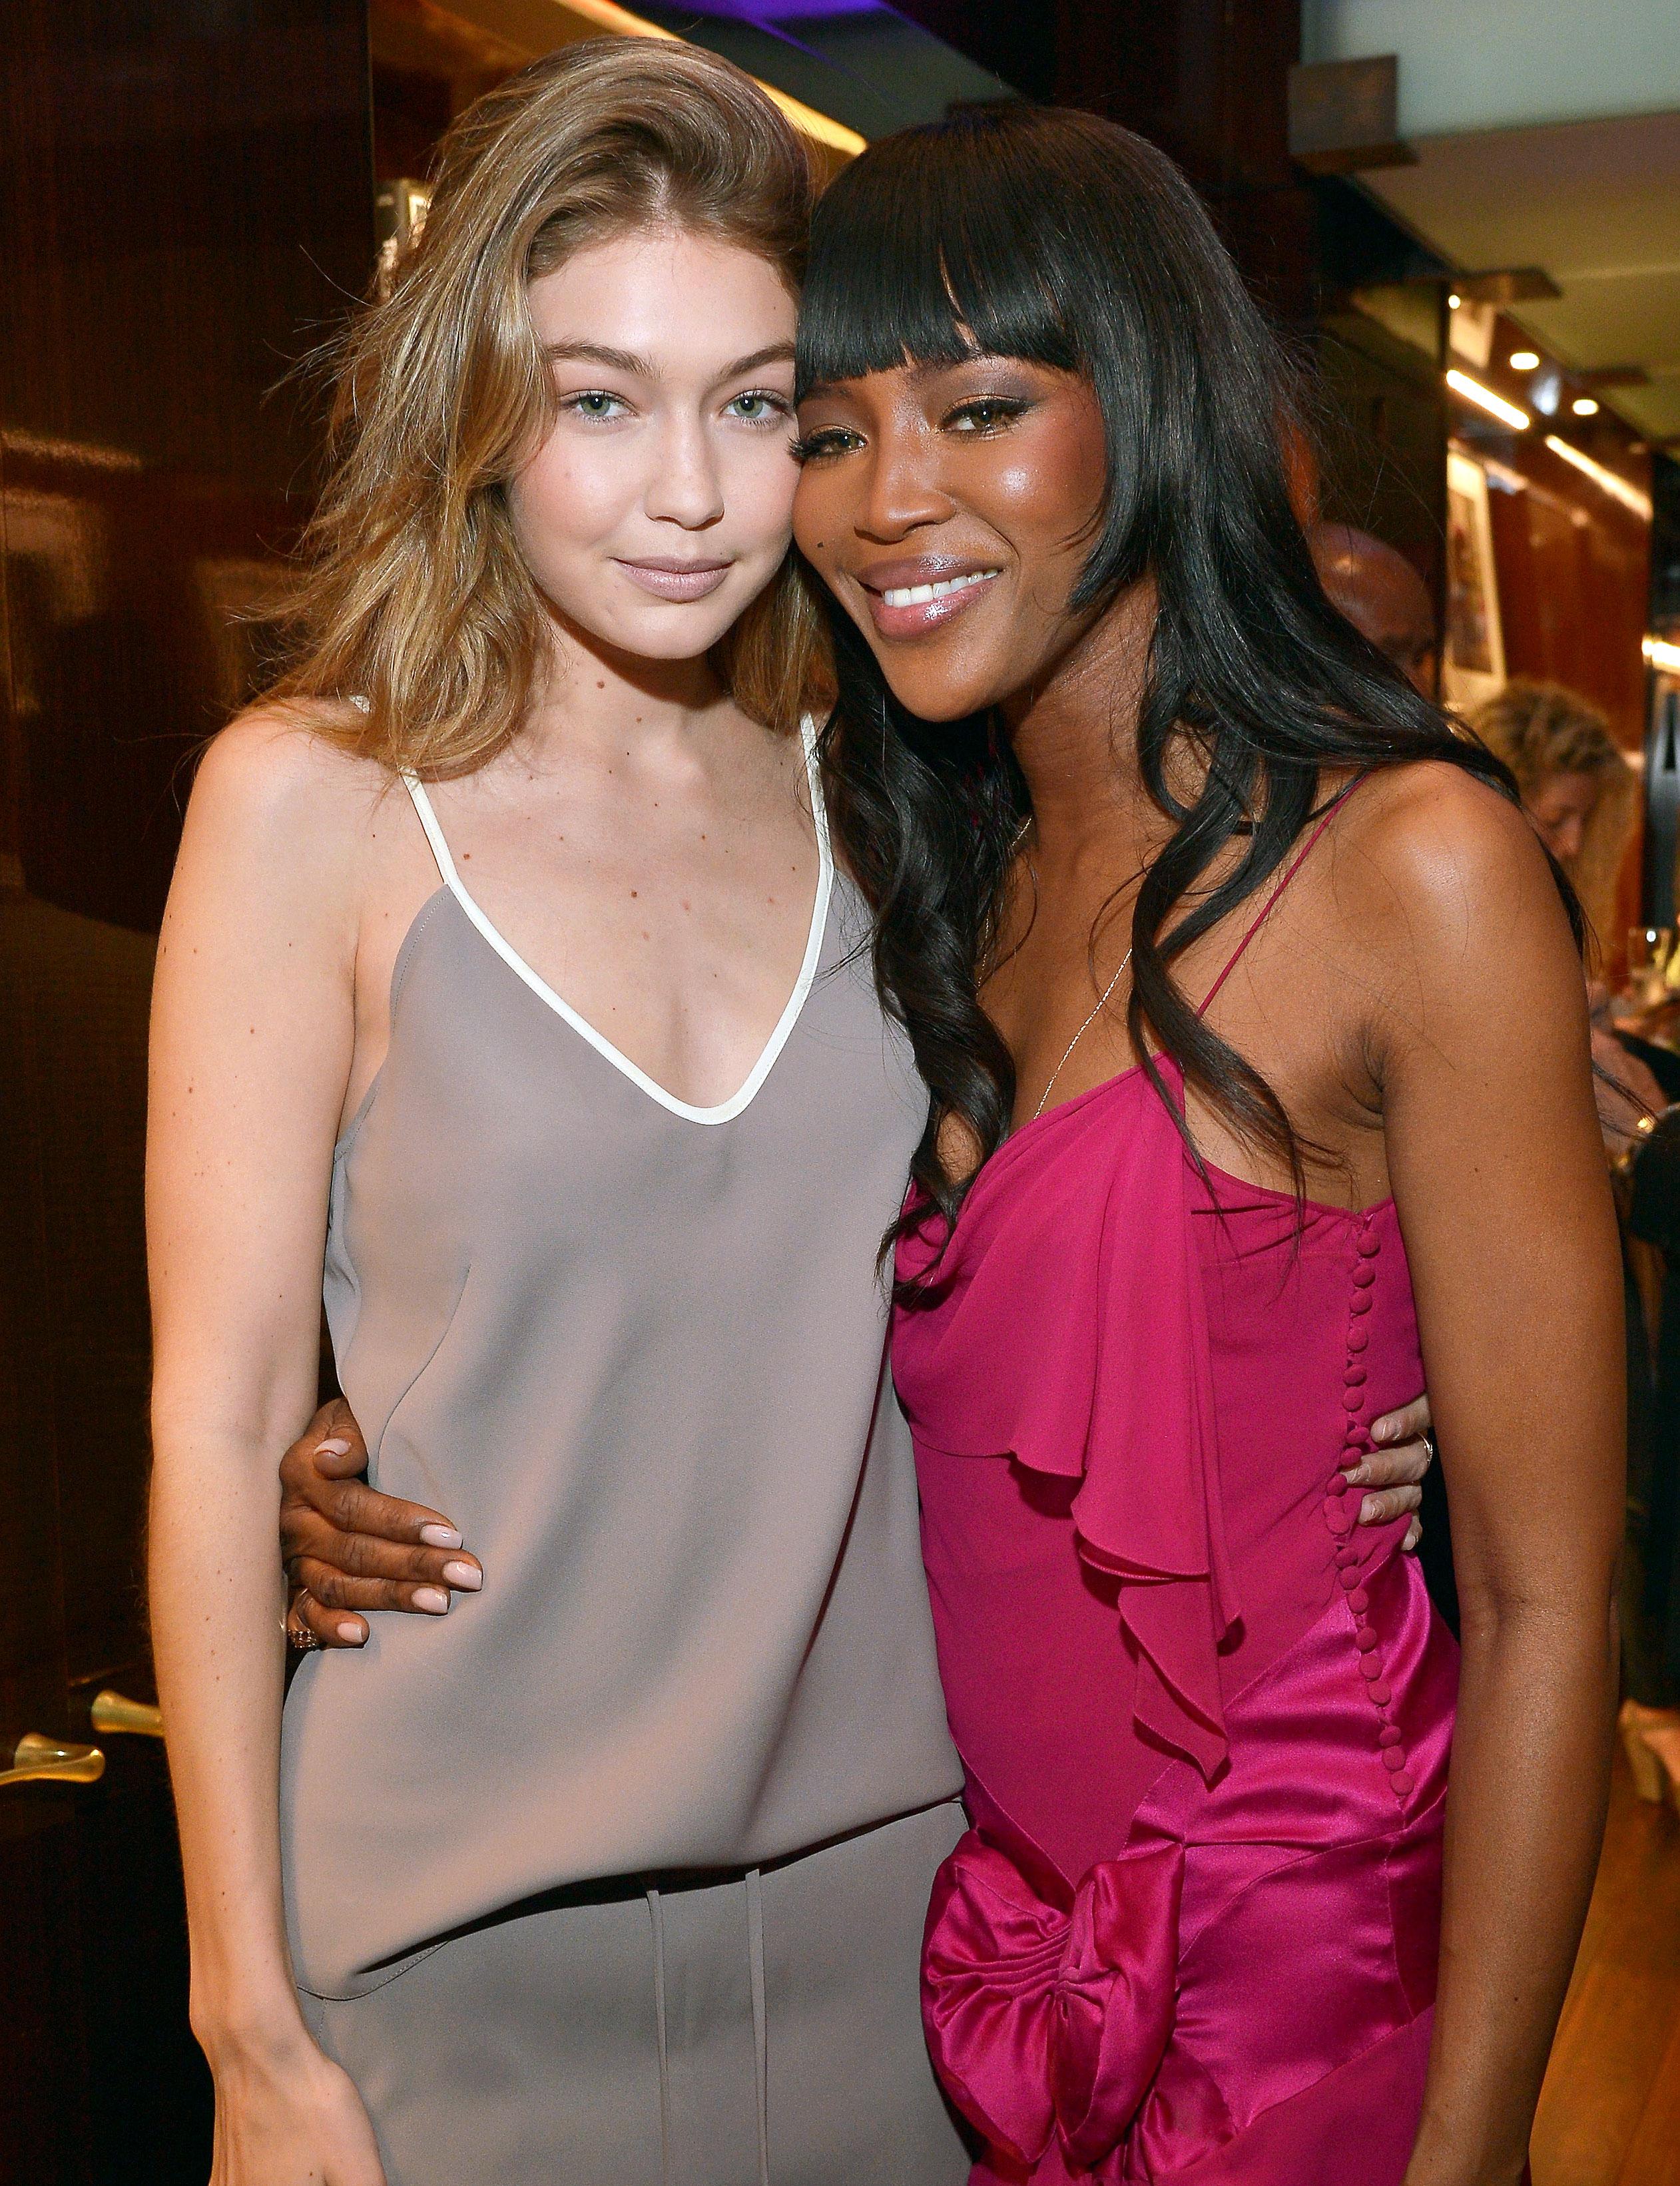 Naomi Campbell Approves Of Instagram Models Like Gigi H-4328